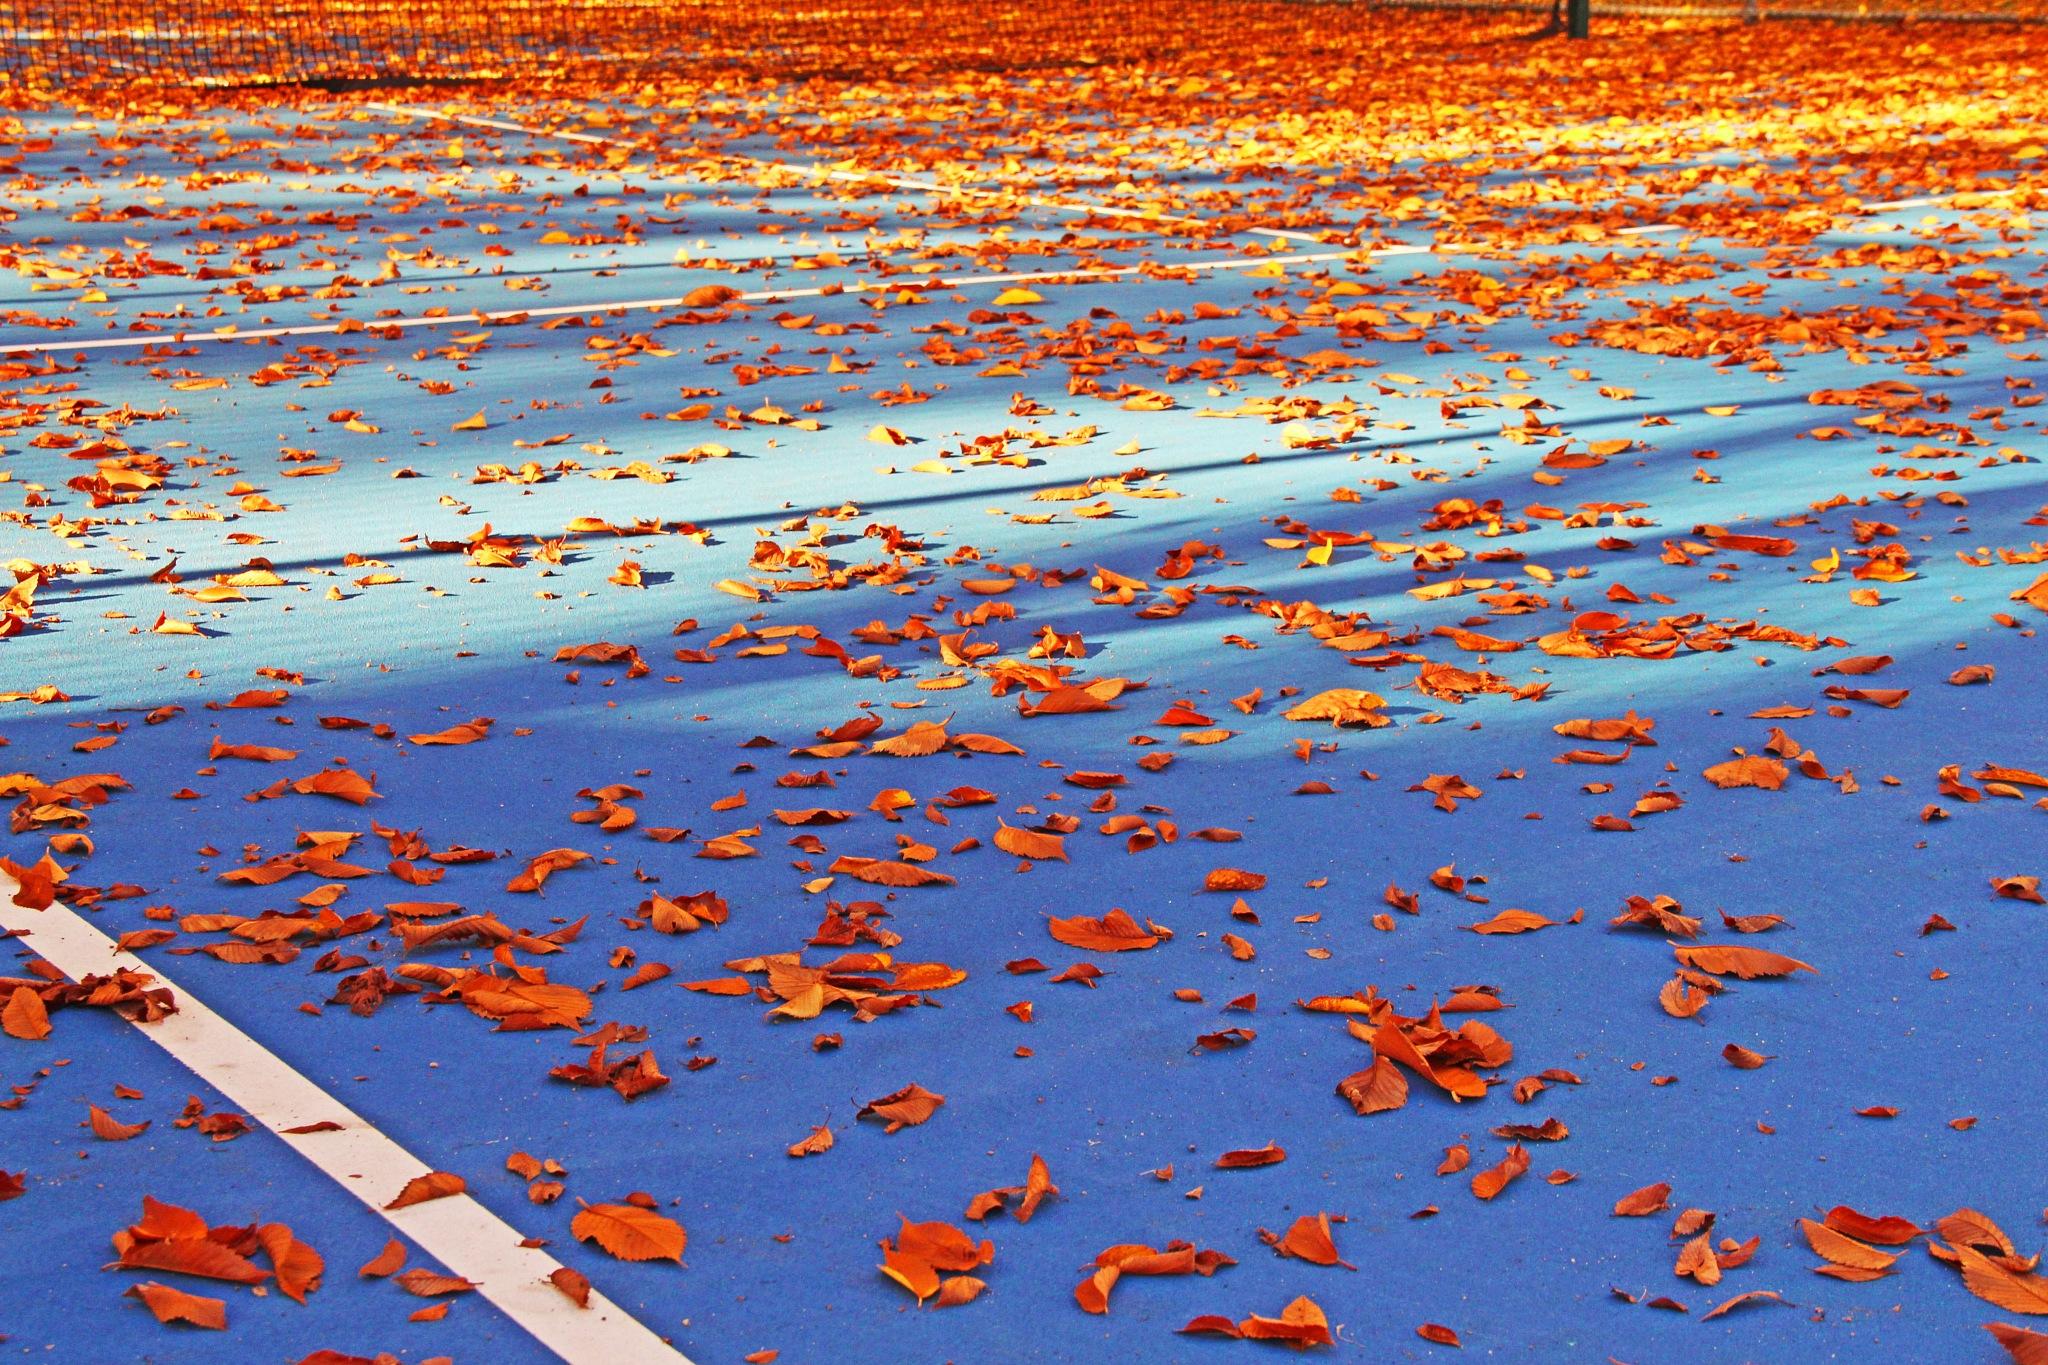 Leaves Feelin' Blue by christena.anderson